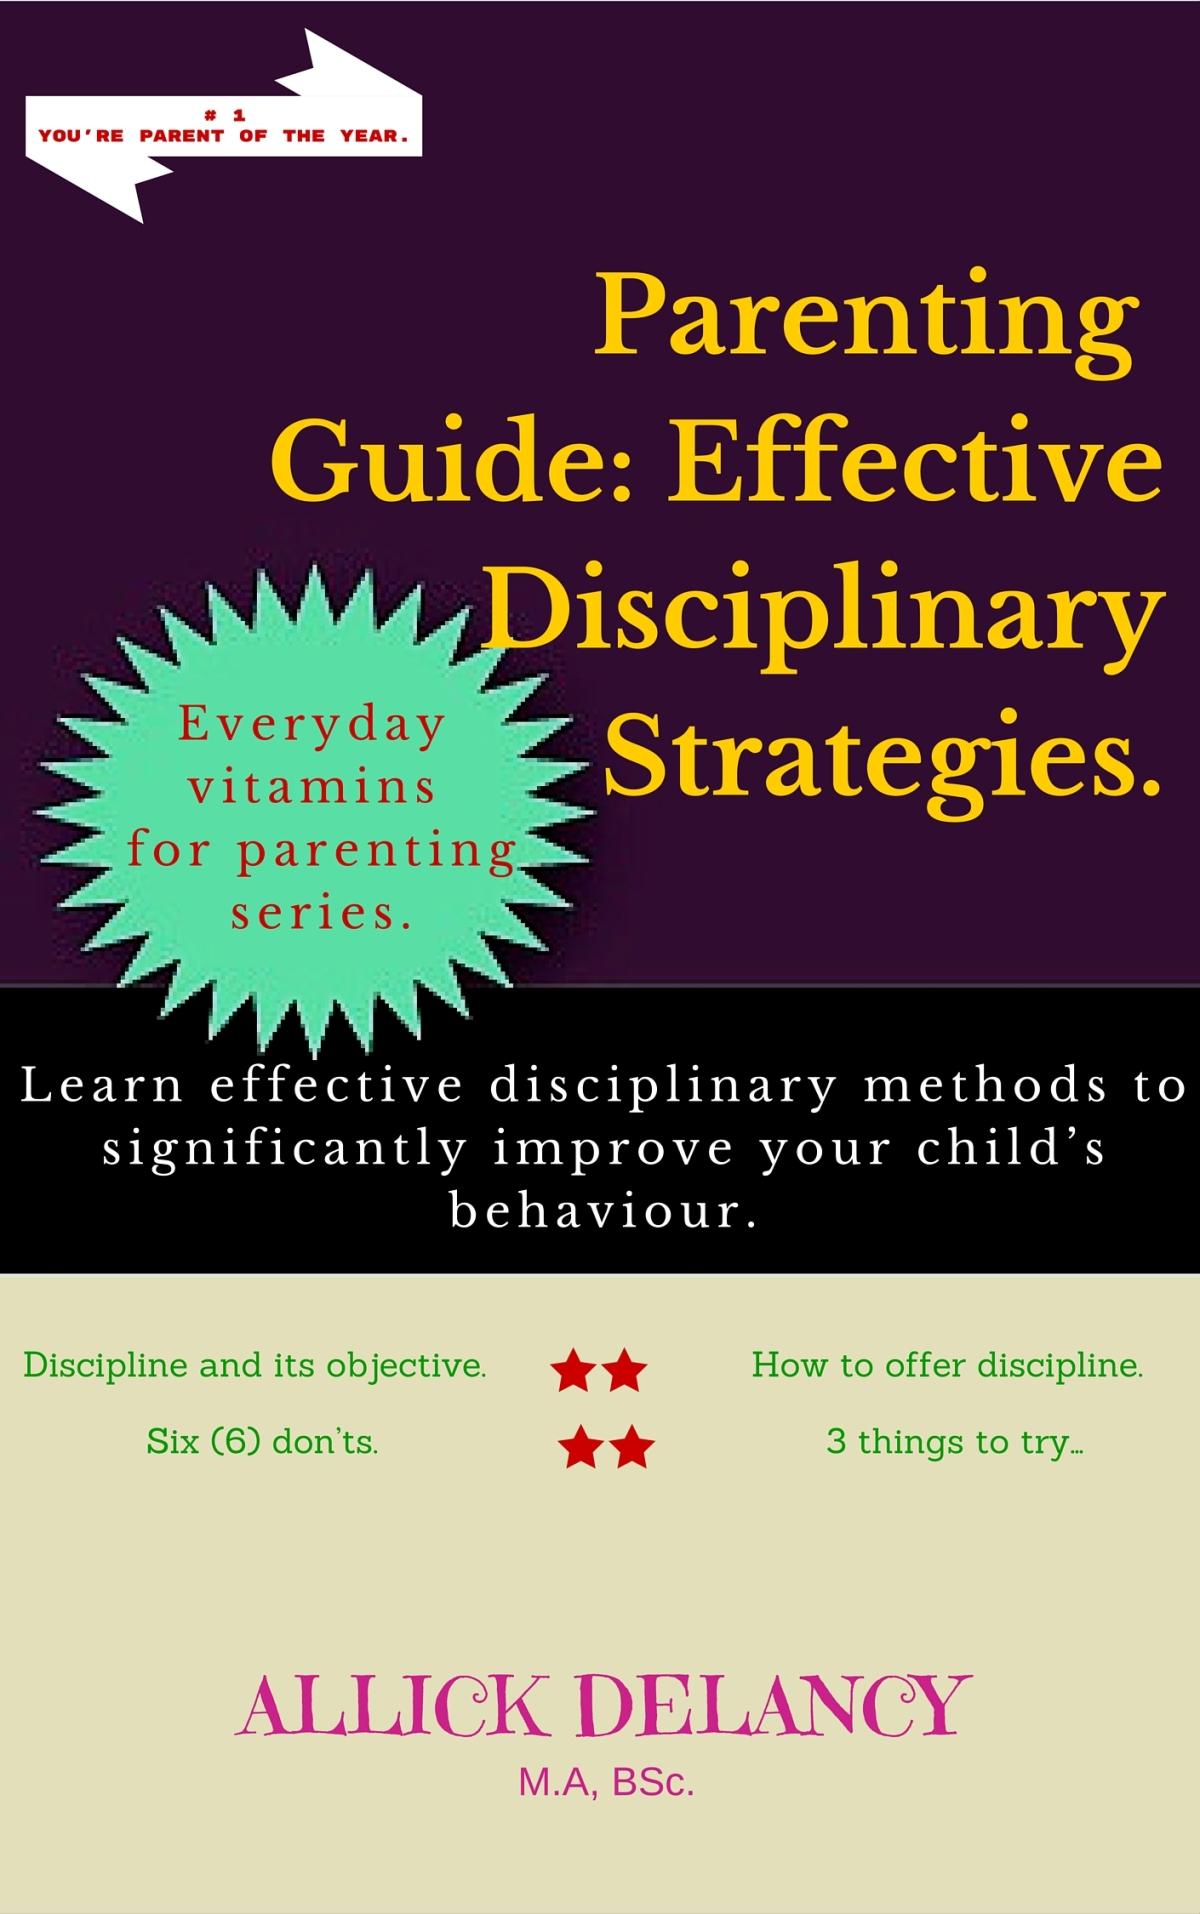 Parenting Guide: Effective disciplinarystrategies…